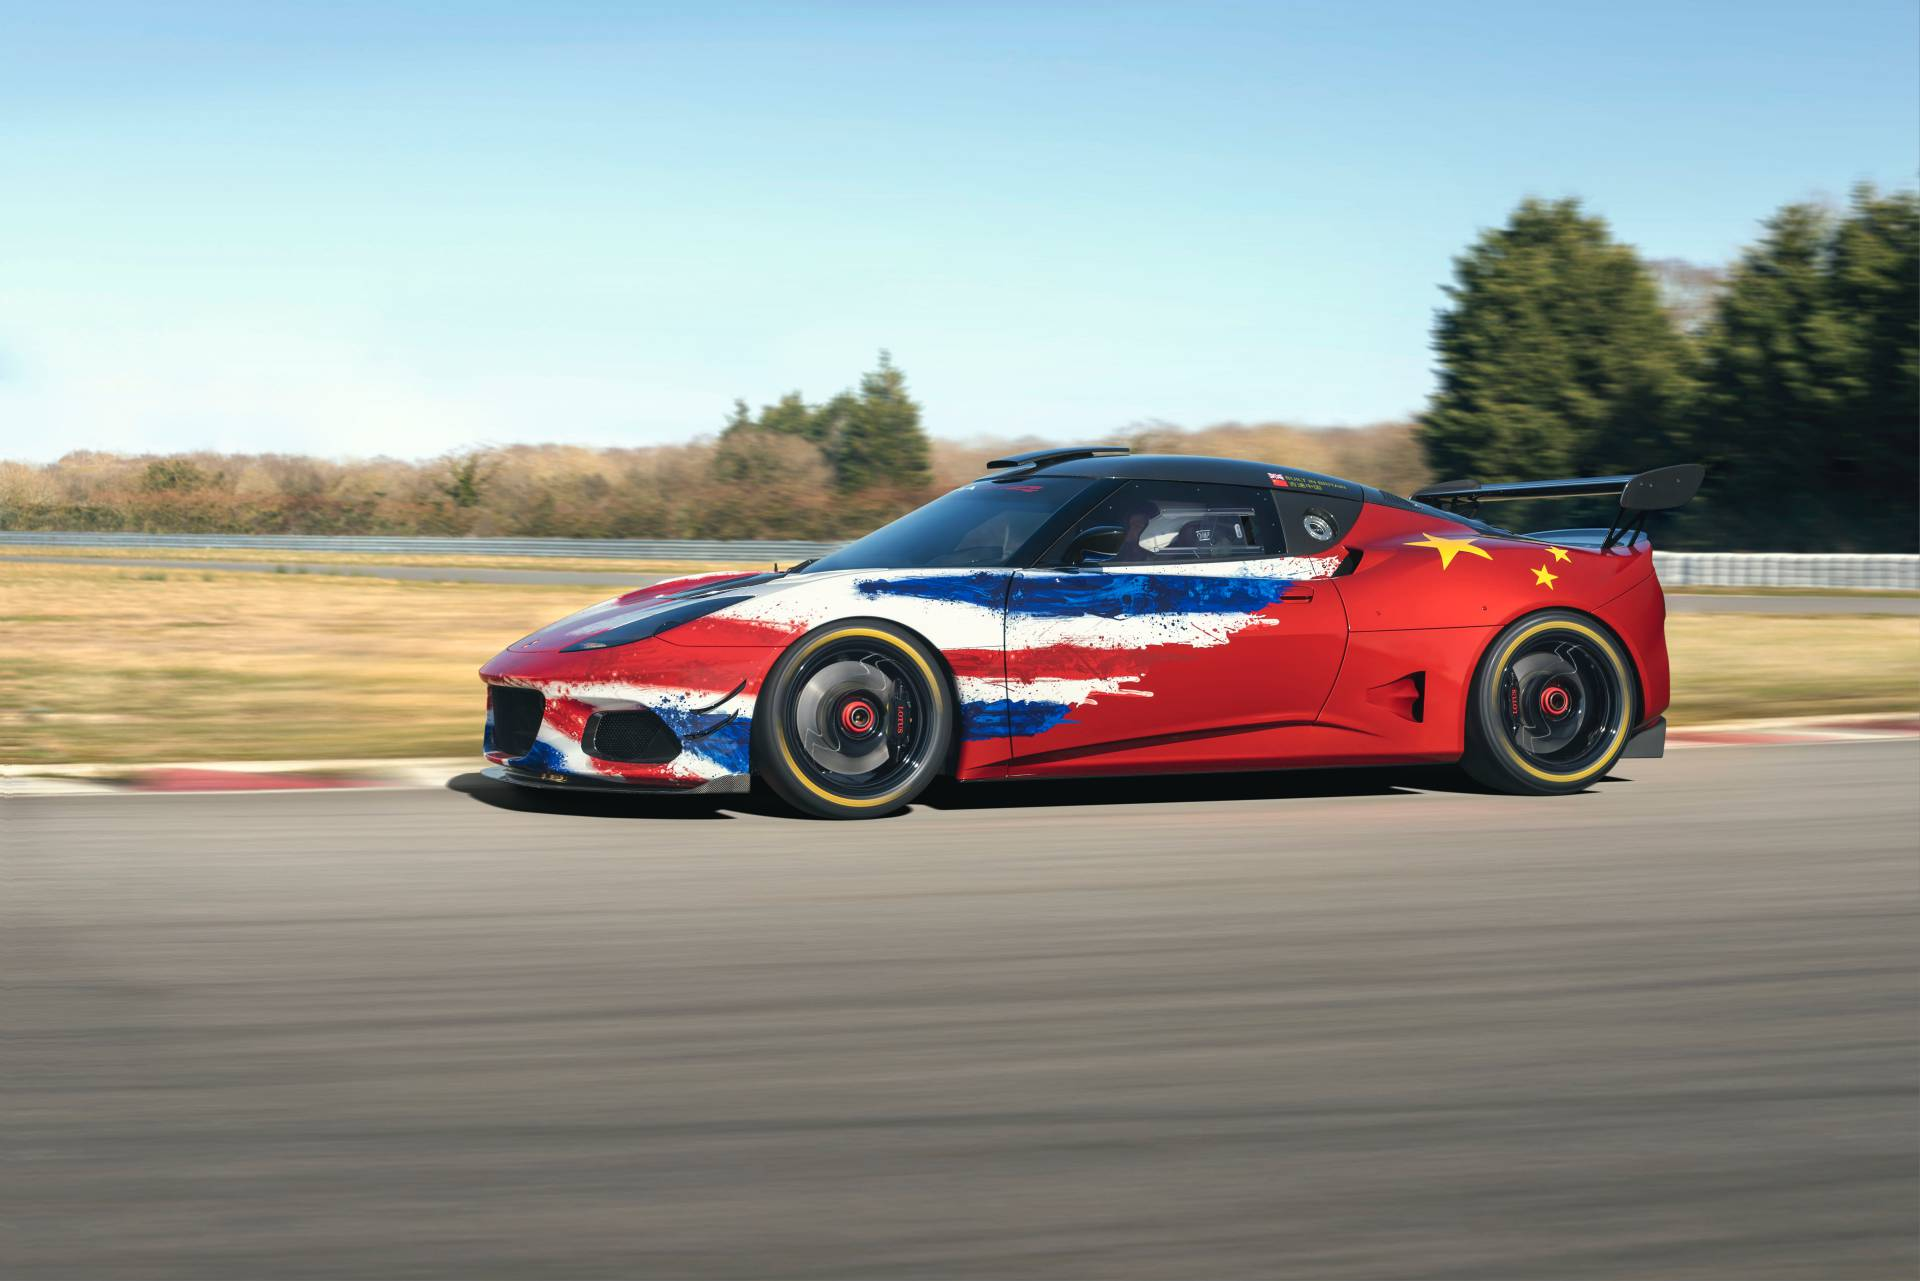 Lotus-Evora-GT4-Concept-5